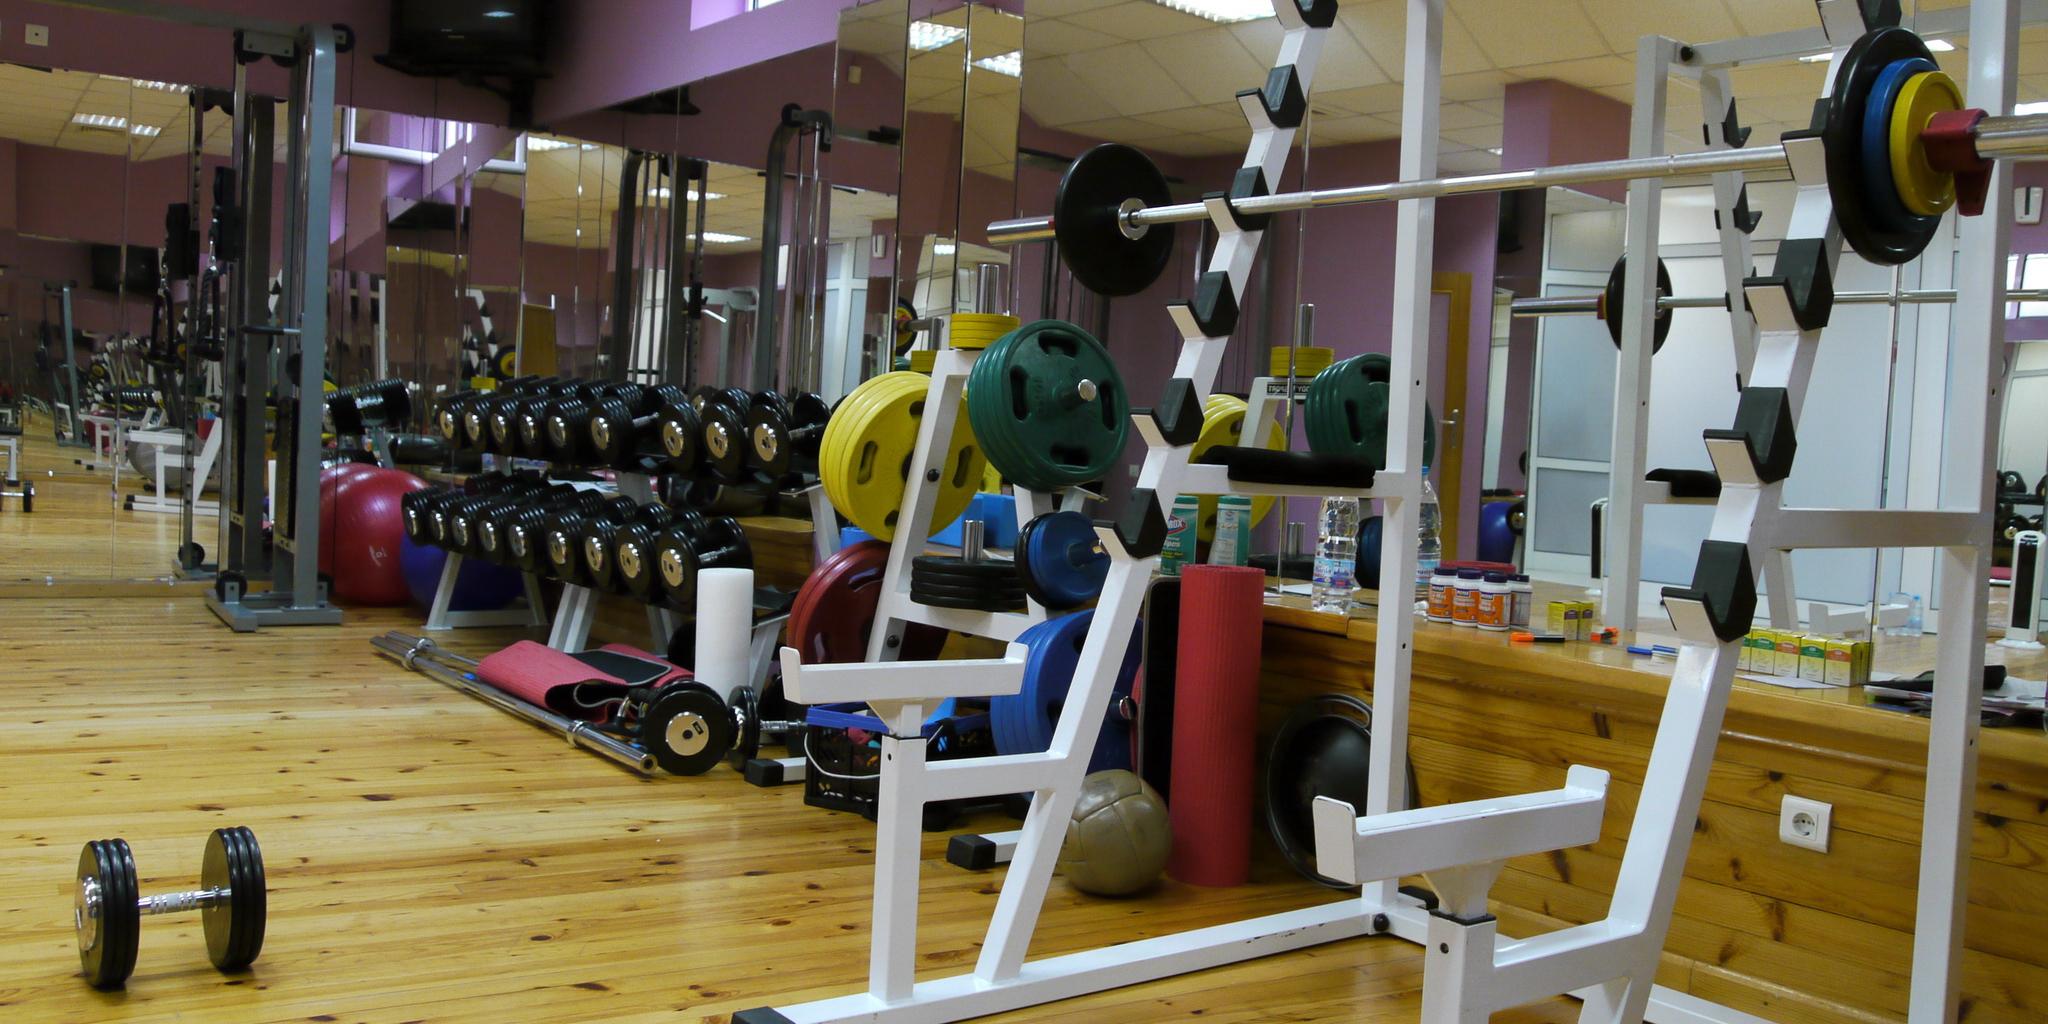 През 2009 SPIDER SPORT отвори ново фитнес студио в Лозенец